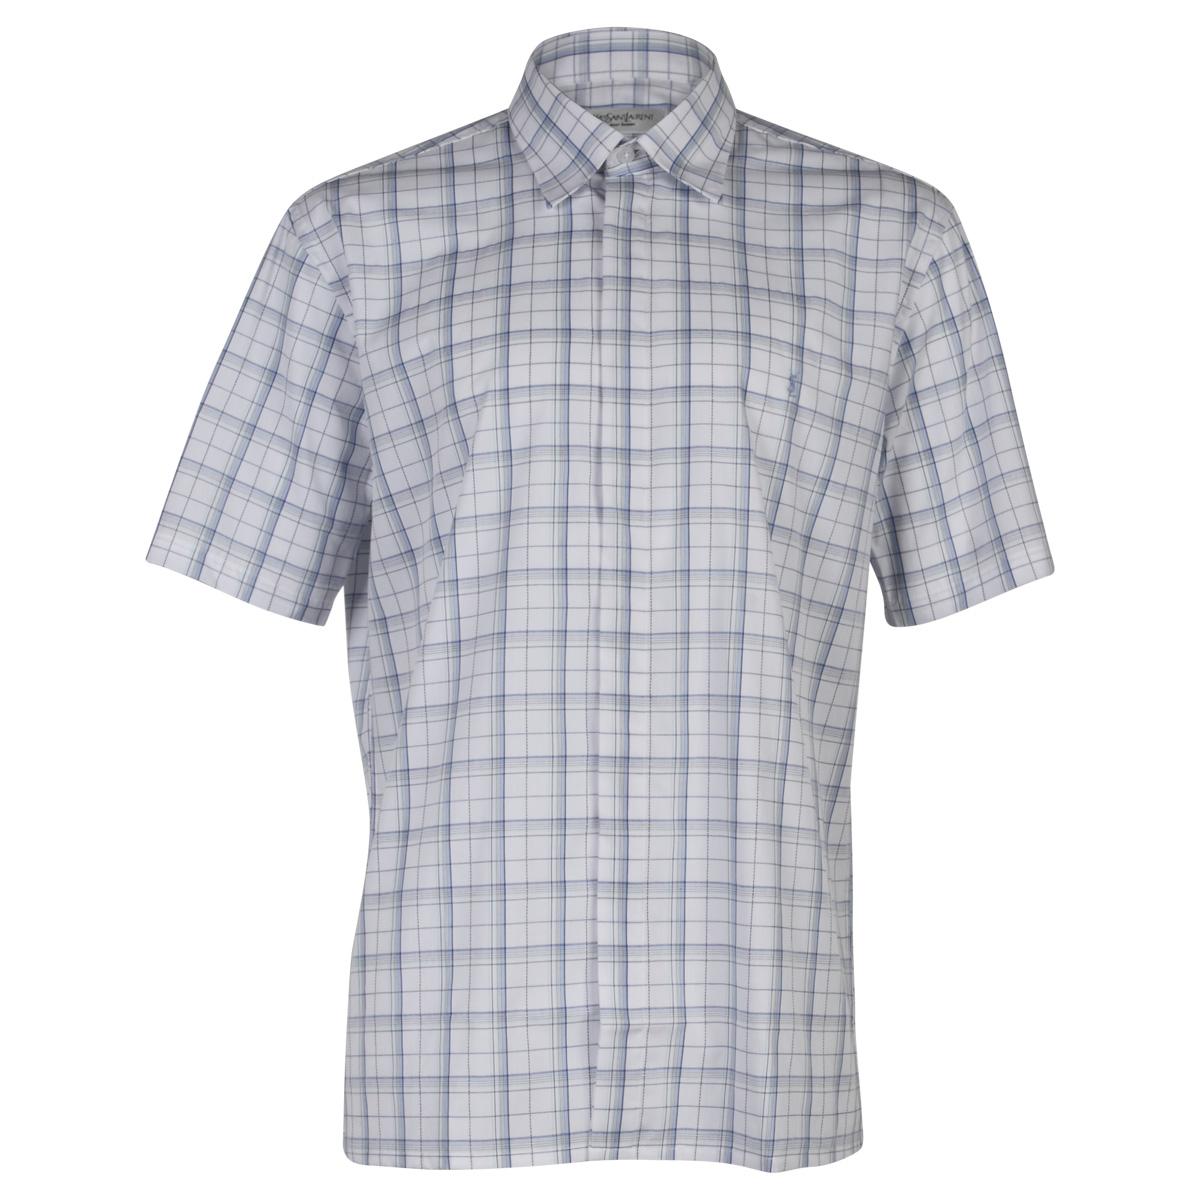 yves saint laurent chemise homme ysl bleu blanc manches courtes taille l xxl ebay. Black Bedroom Furniture Sets. Home Design Ideas